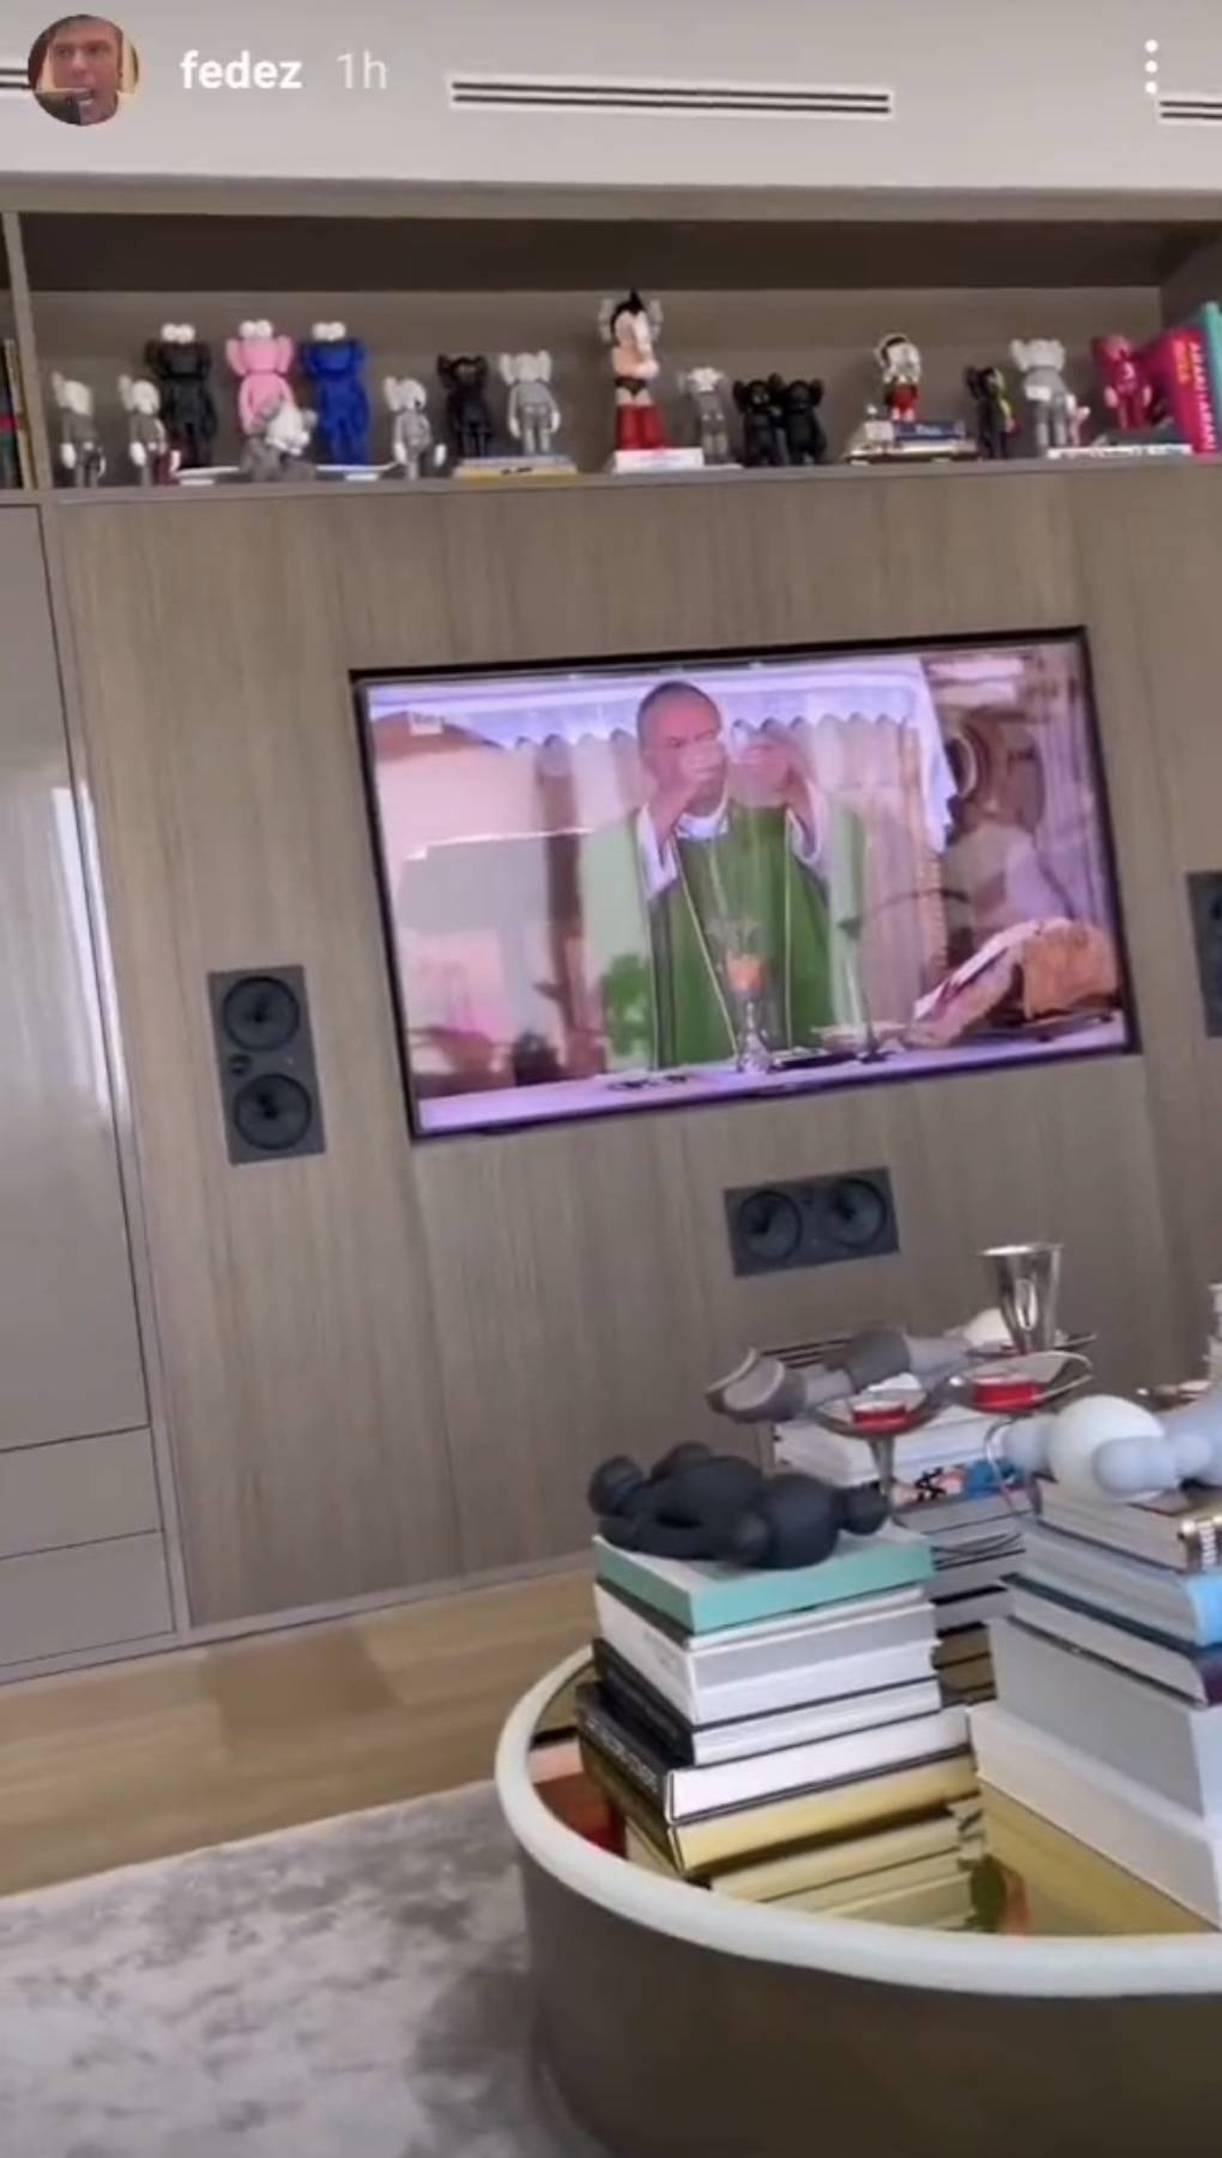 Fedez leone tv messa